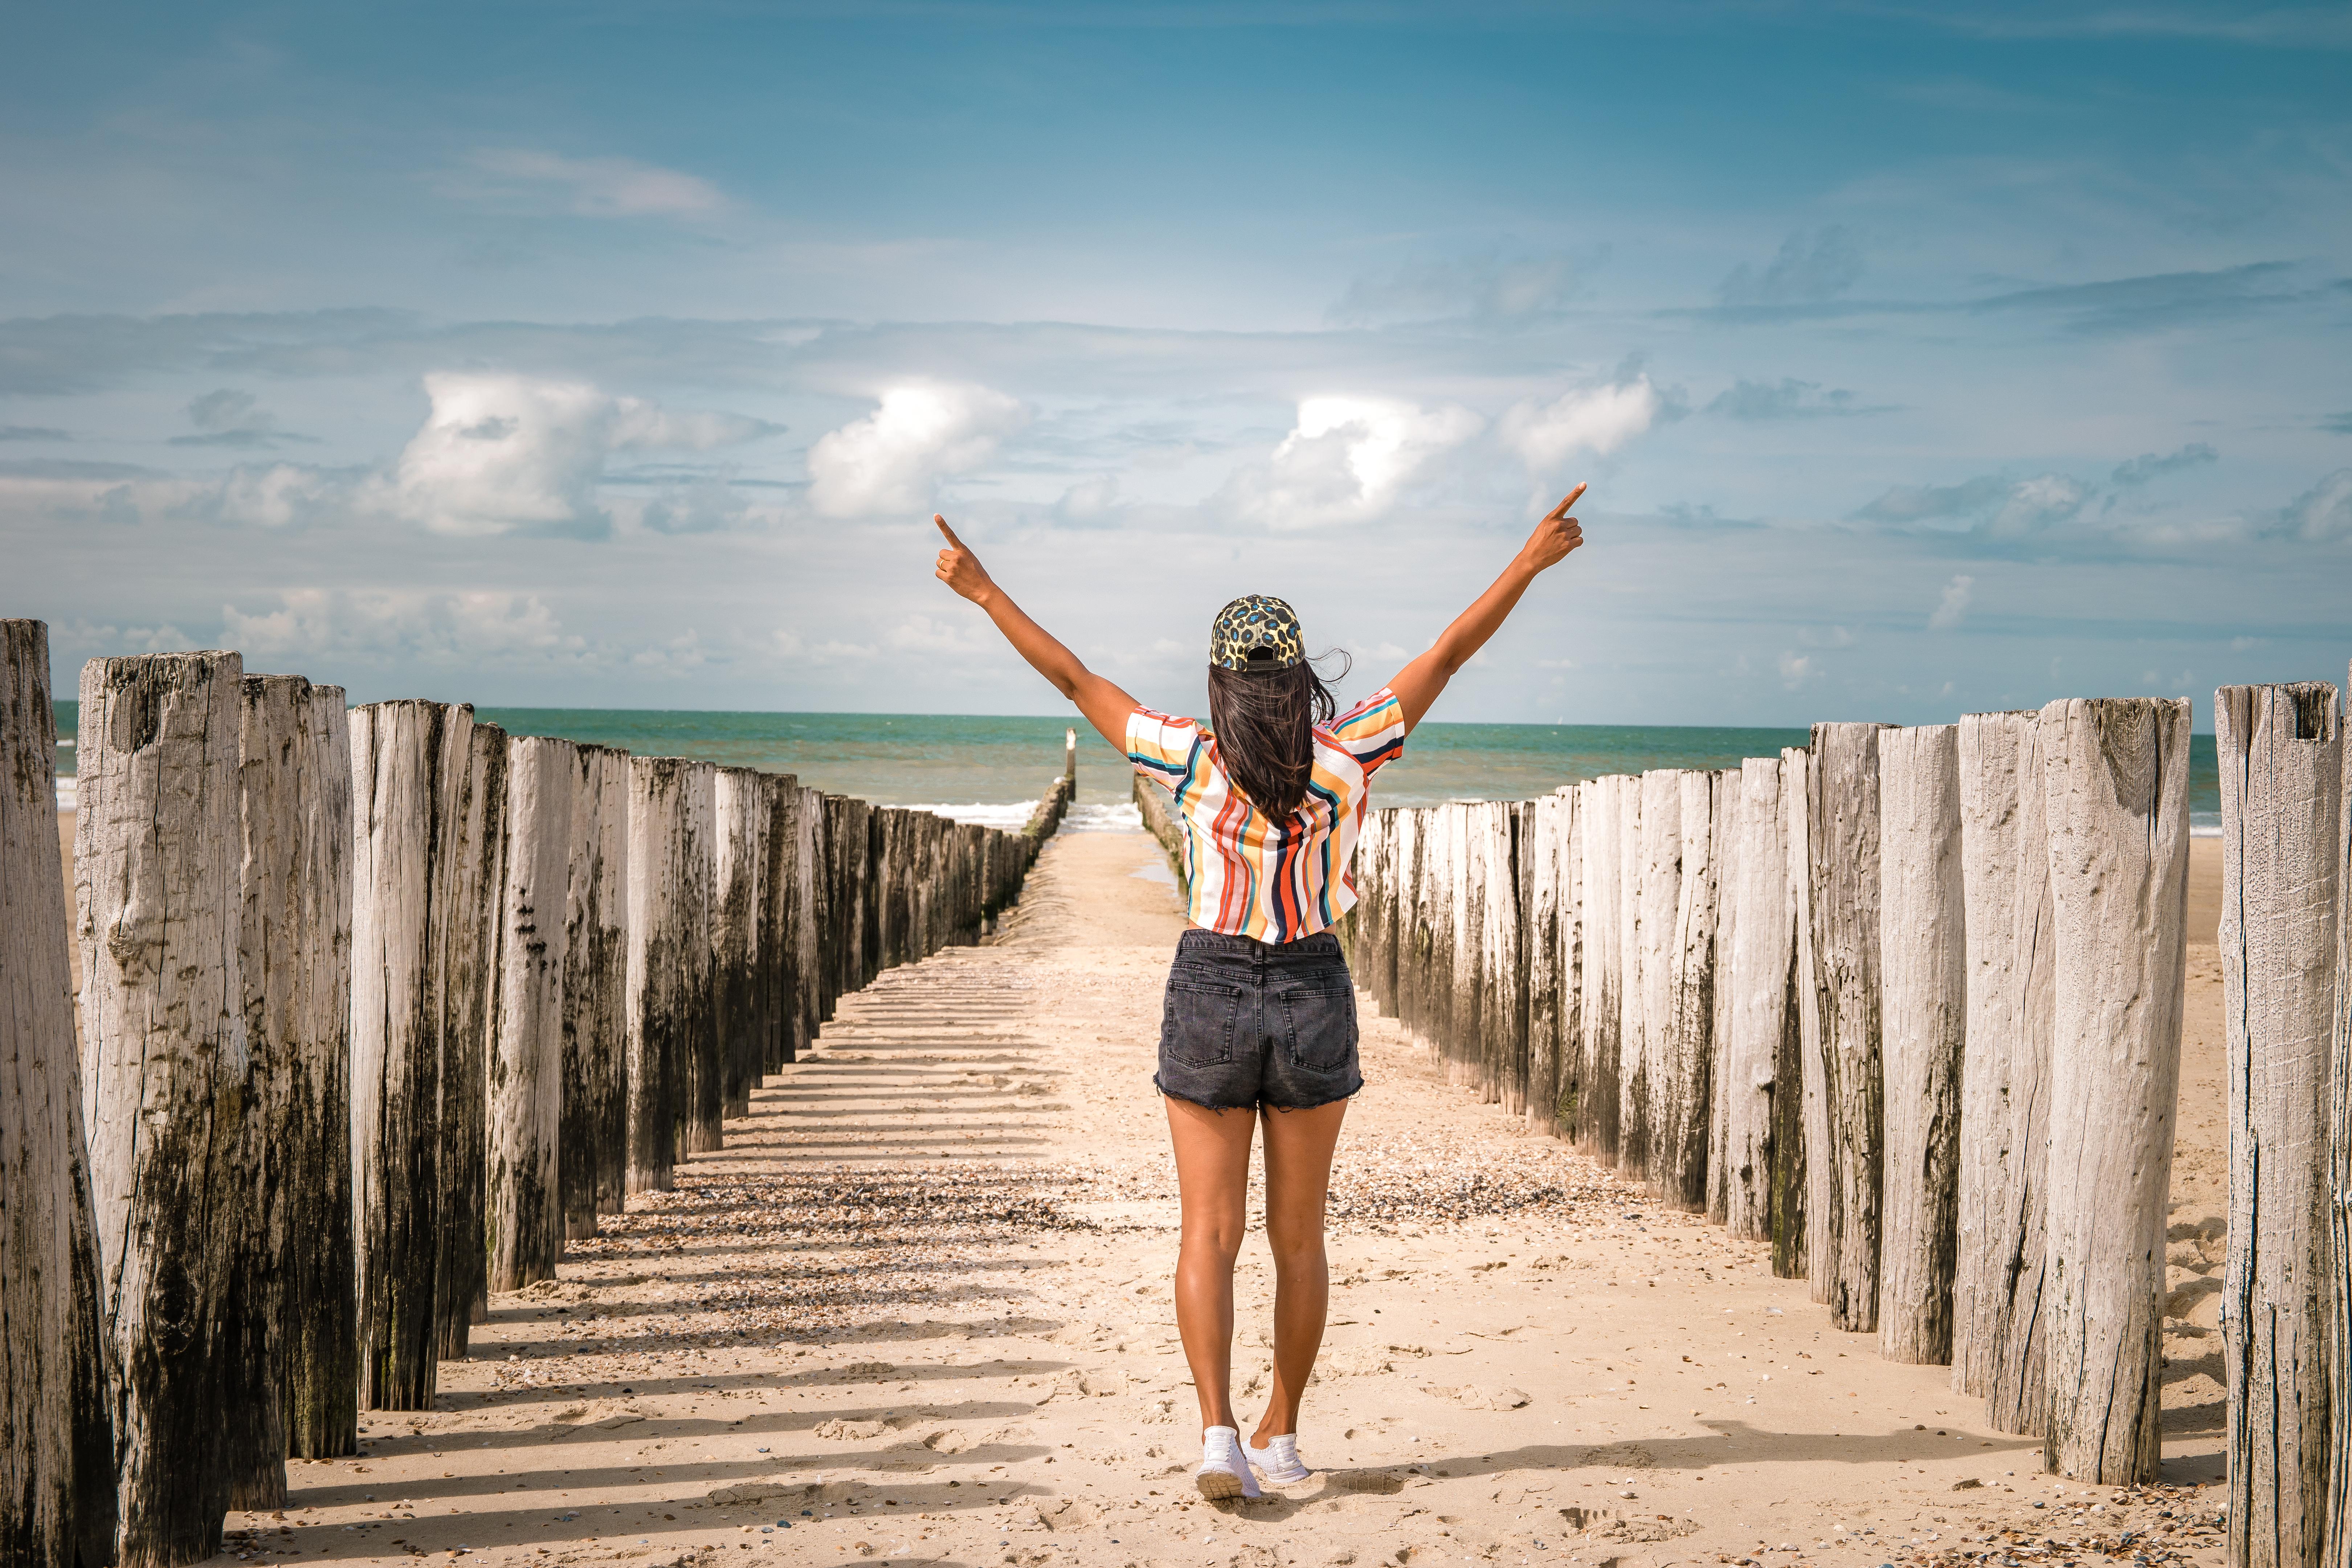 buena vista beach, duurzame vakanties, strandvakantie, strand, groener wonen